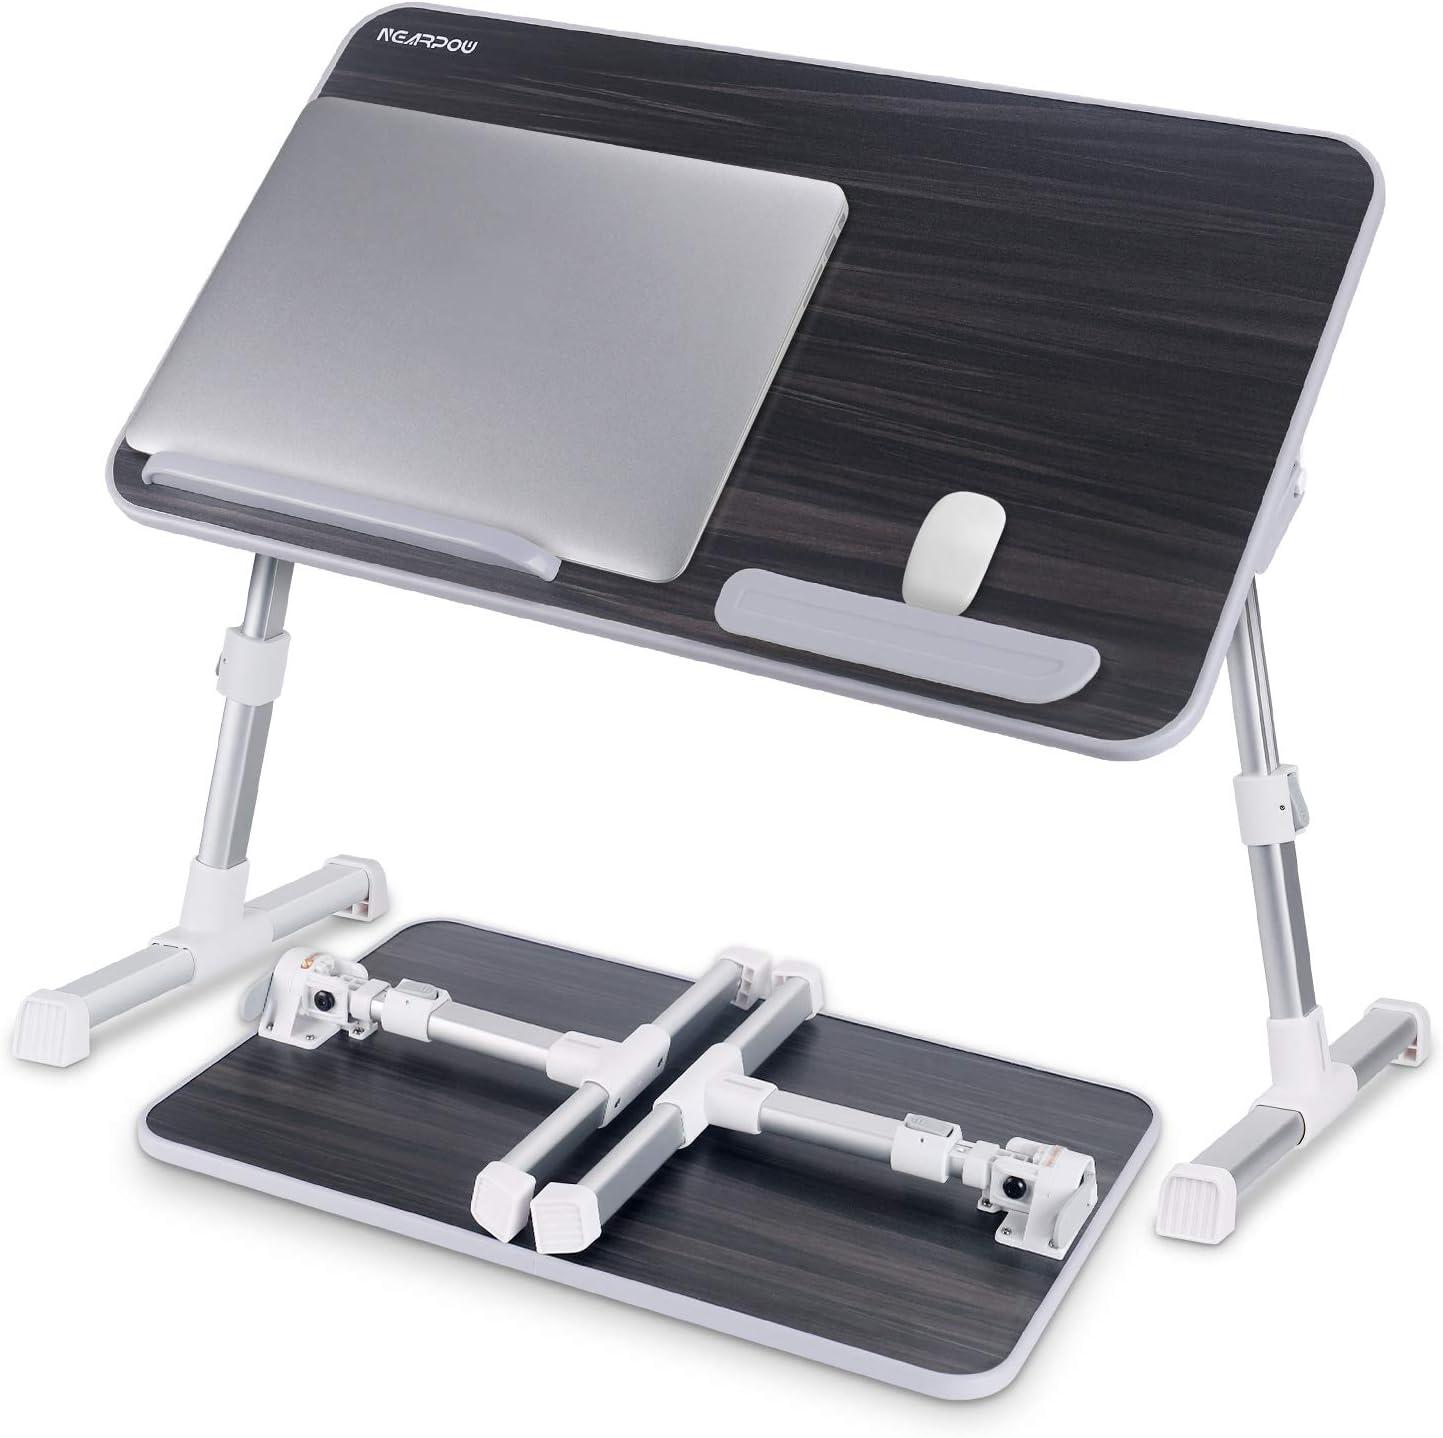 Laptop Bed TableNearpow Adjustable